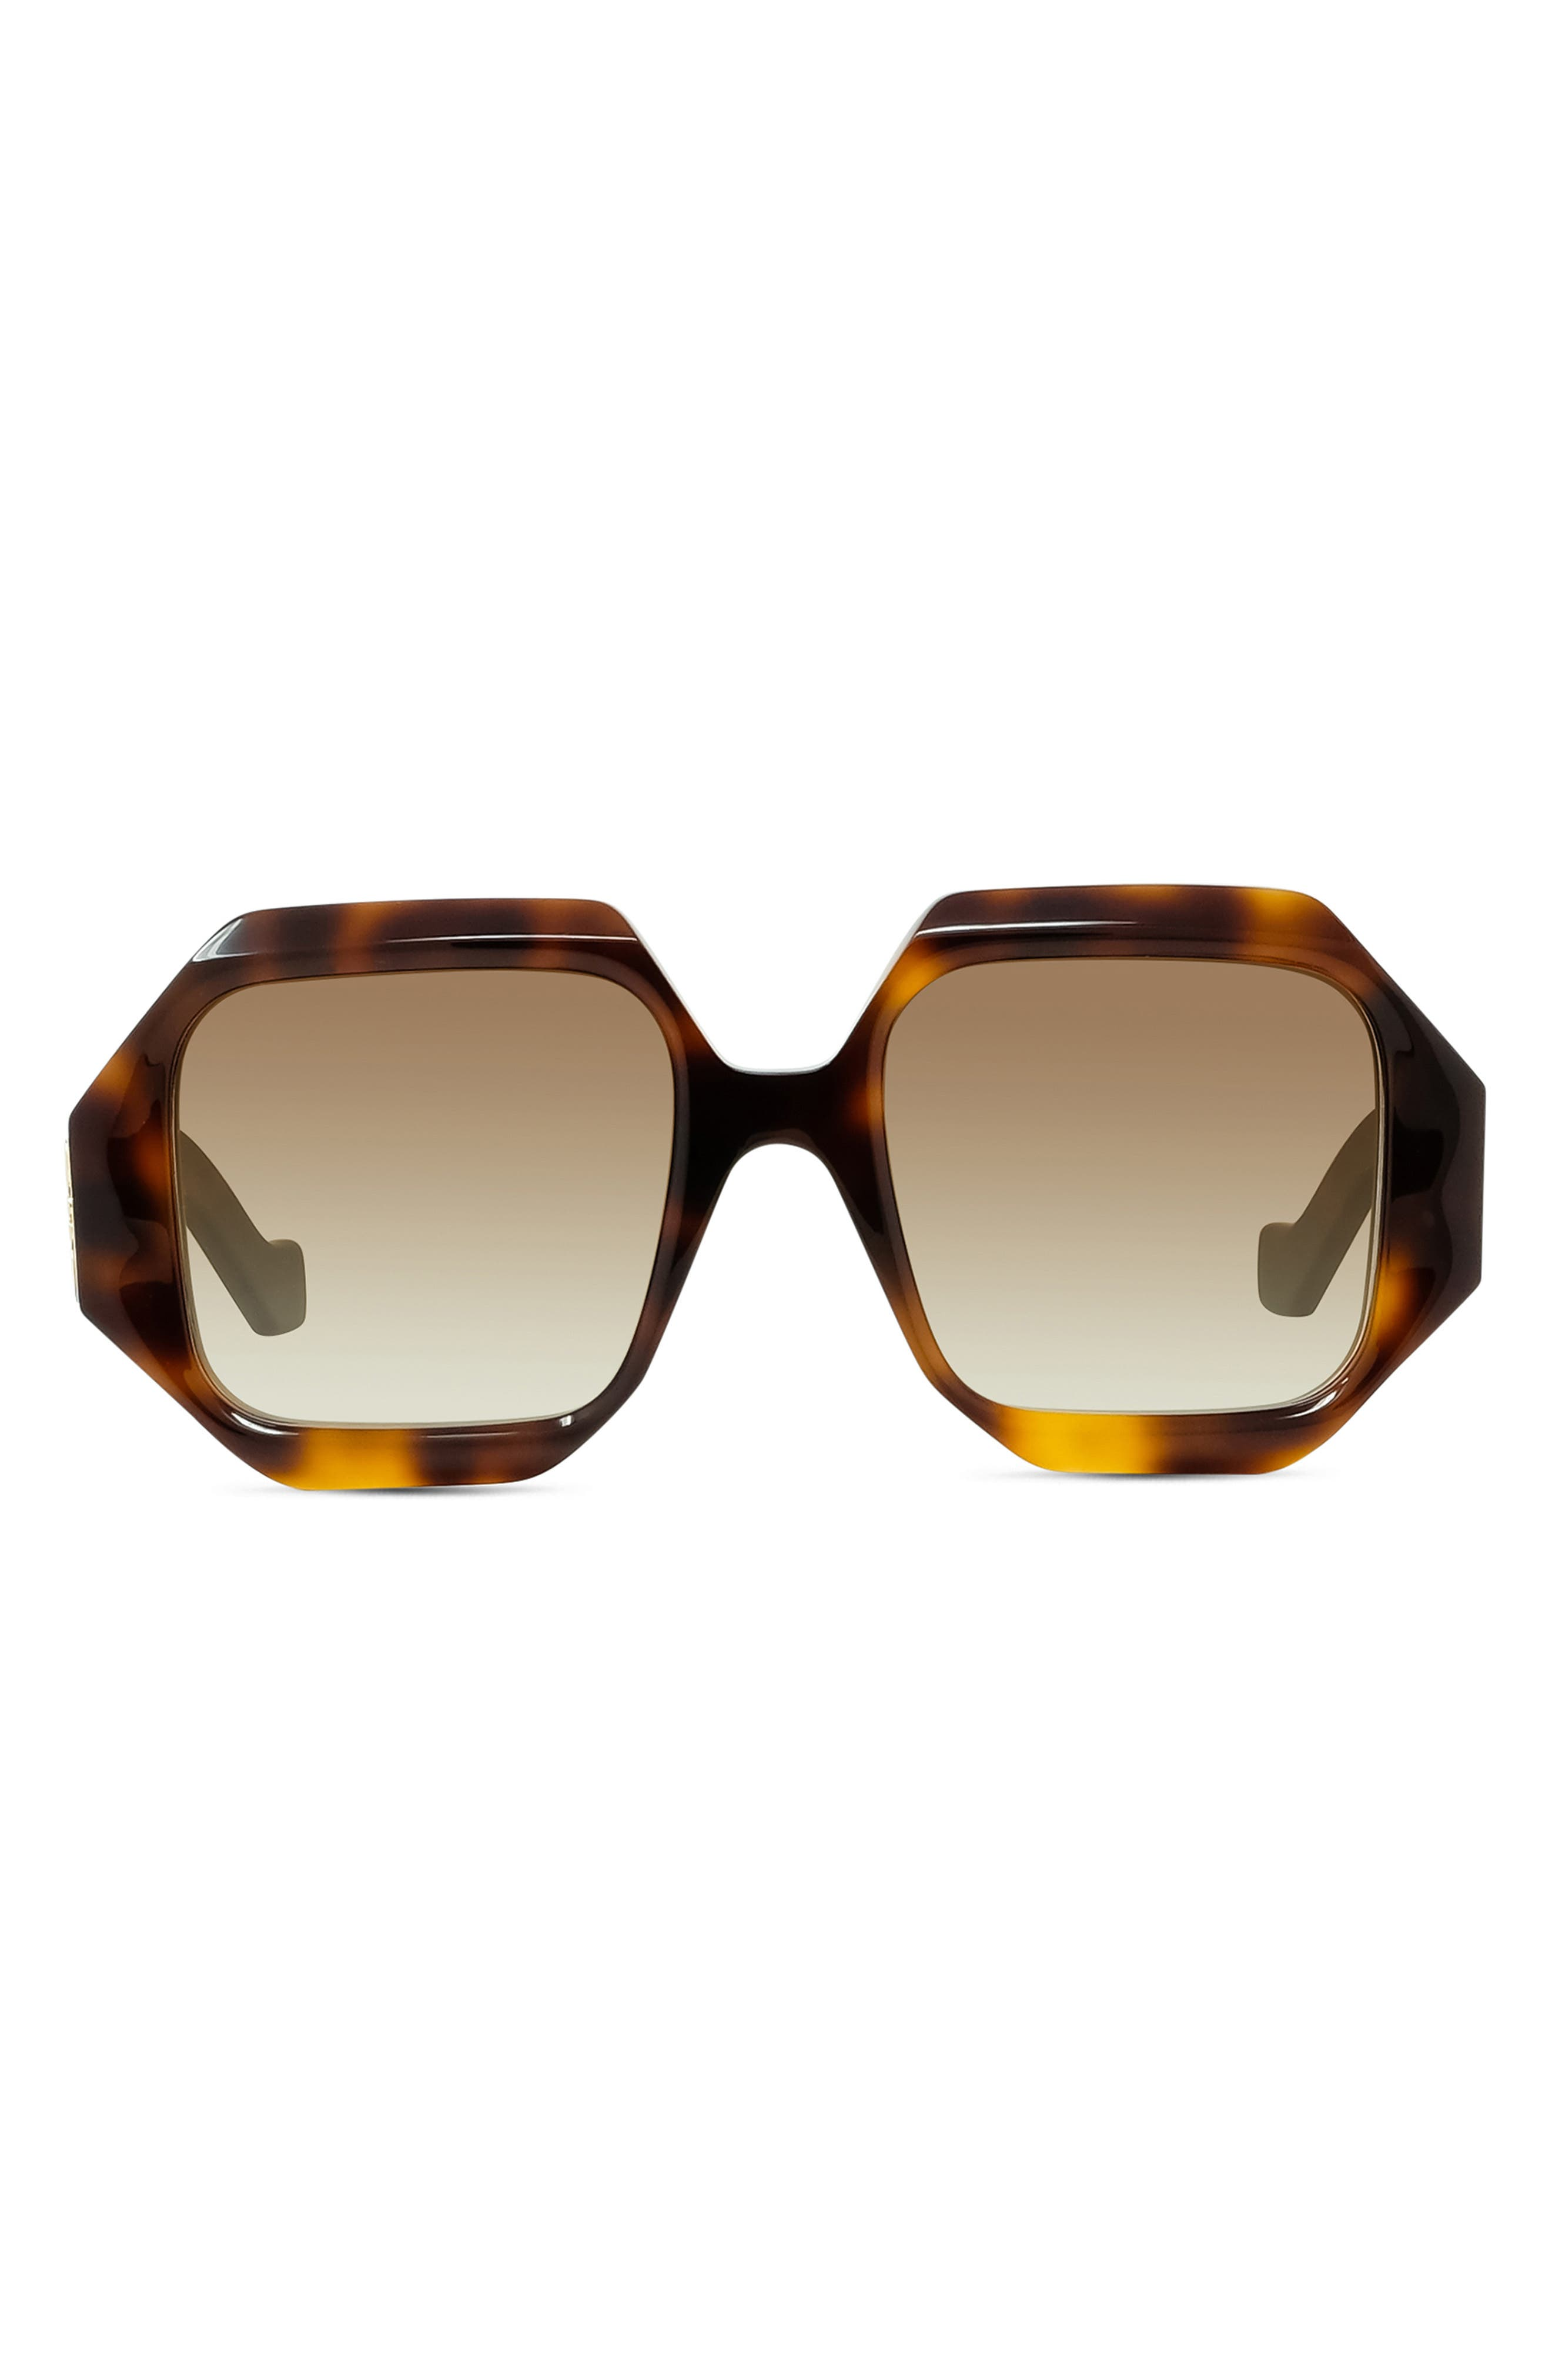 Women's Loewe 54mm Hexagonal Sunglasses - Classic Havana/brwn Gradient